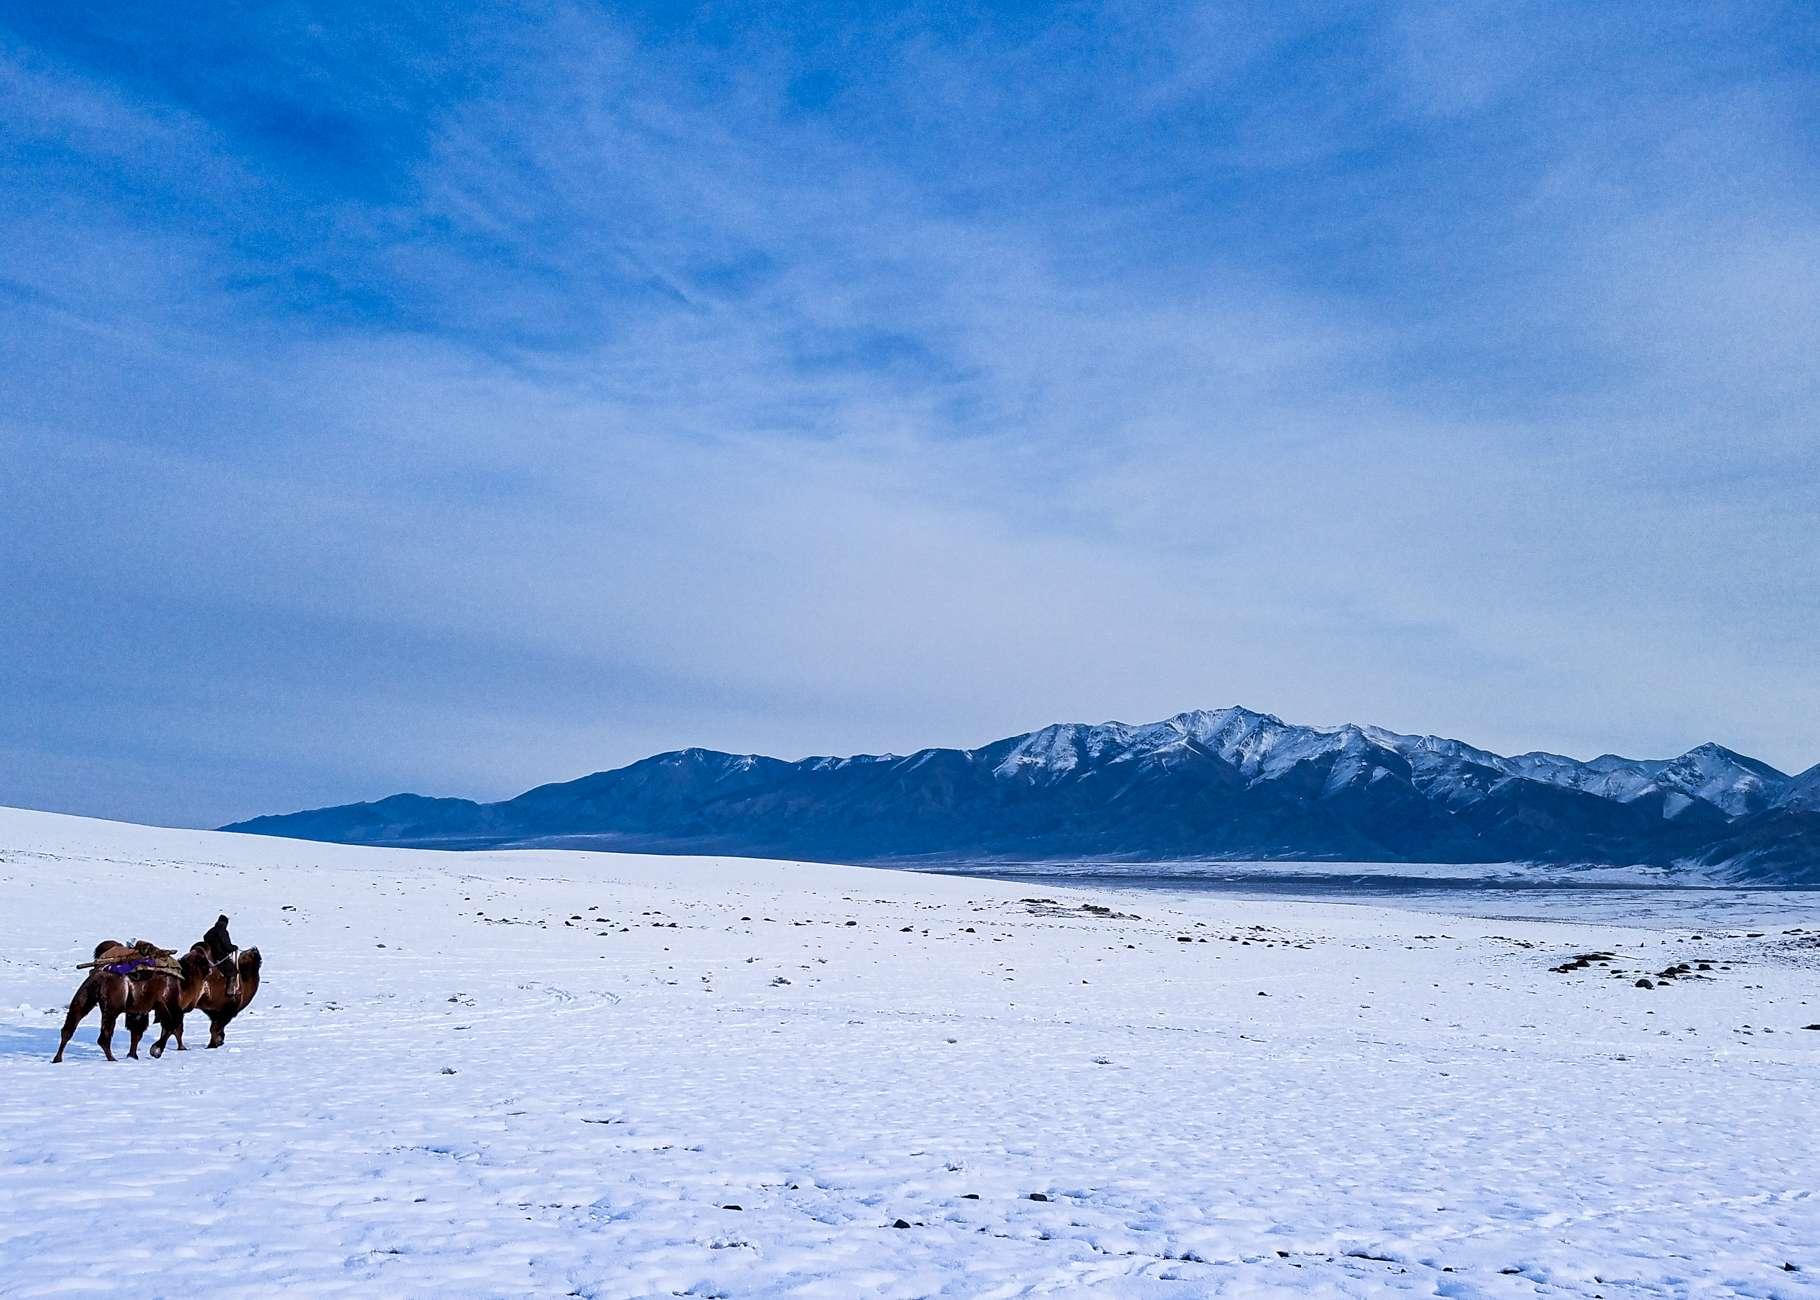 Typical Winter Landscapes On A Snow Leoaprd Tour To Mongolia